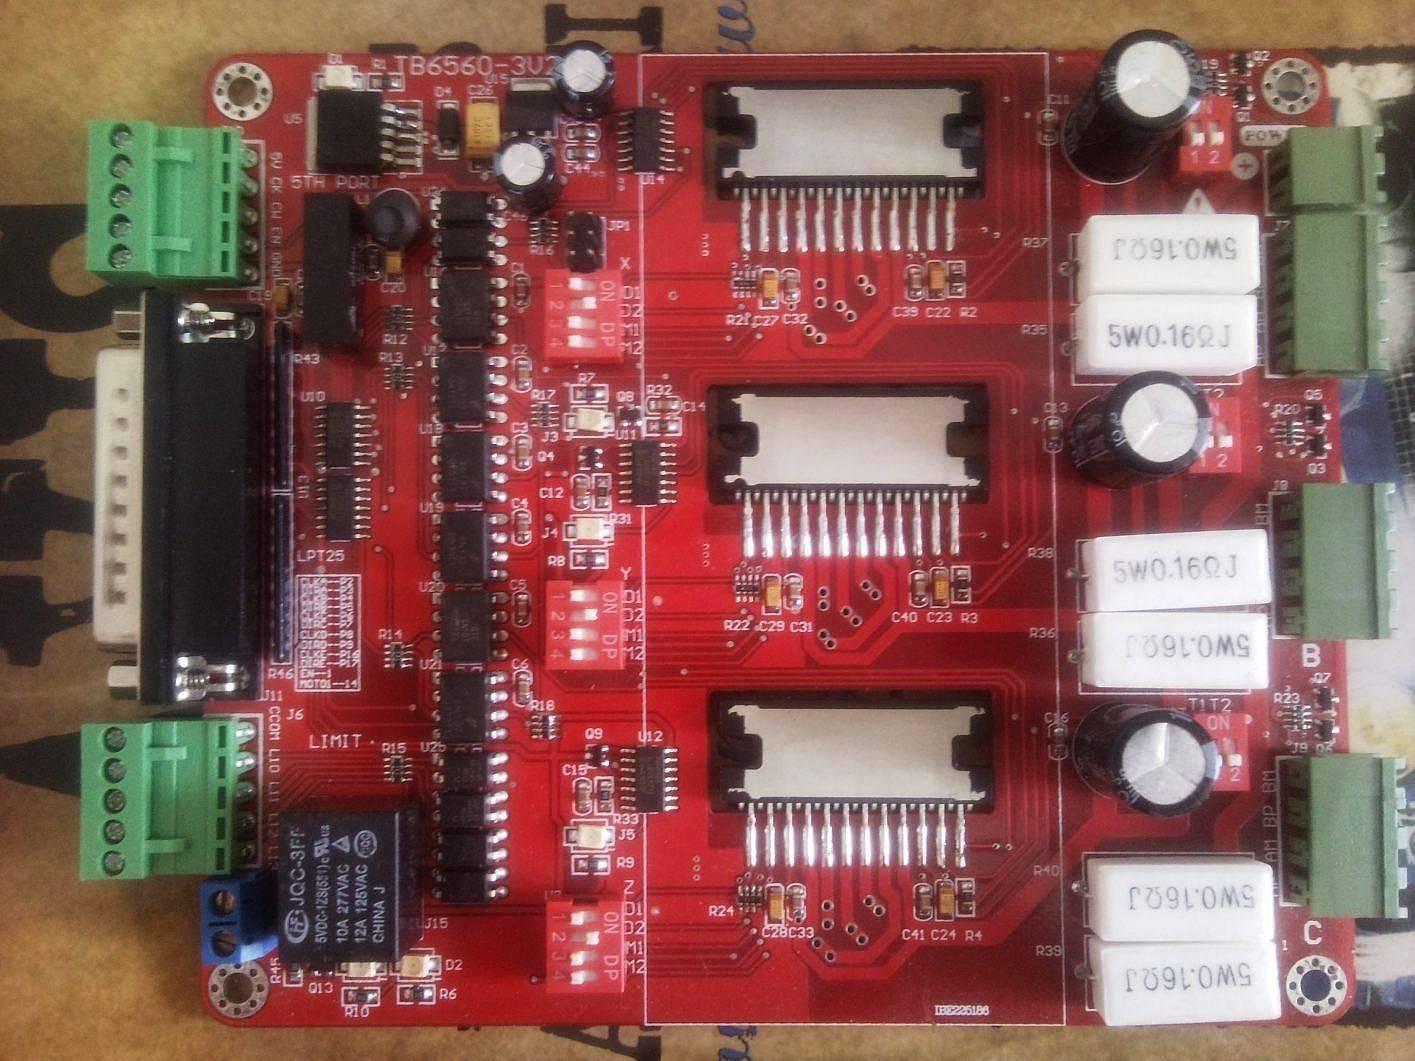 TB6560-3V2 RED.jpg